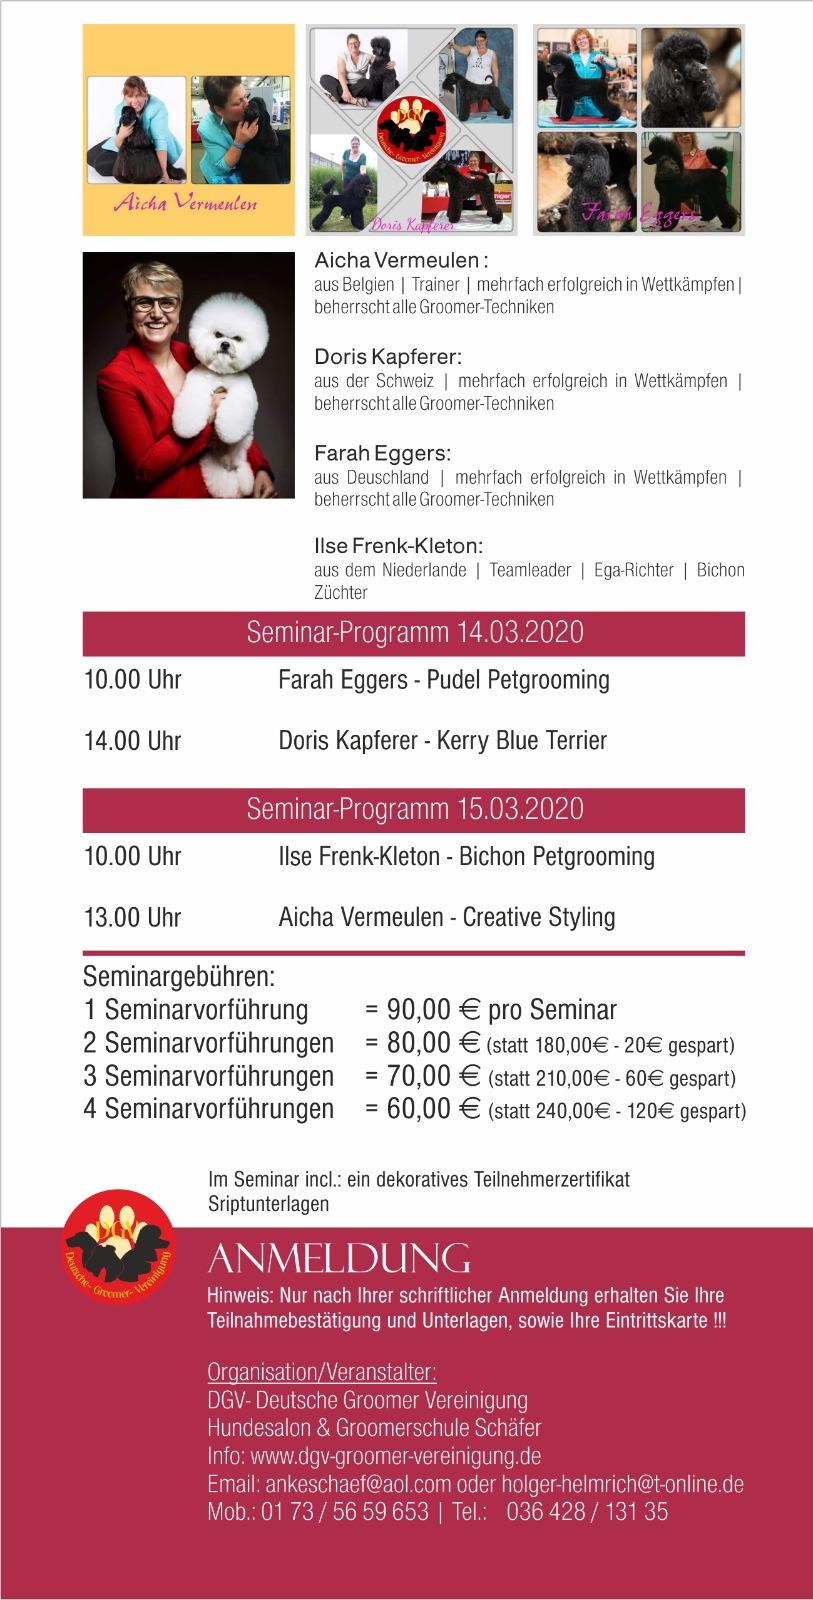 8. GGC - Seminar-Programm Flyer 2